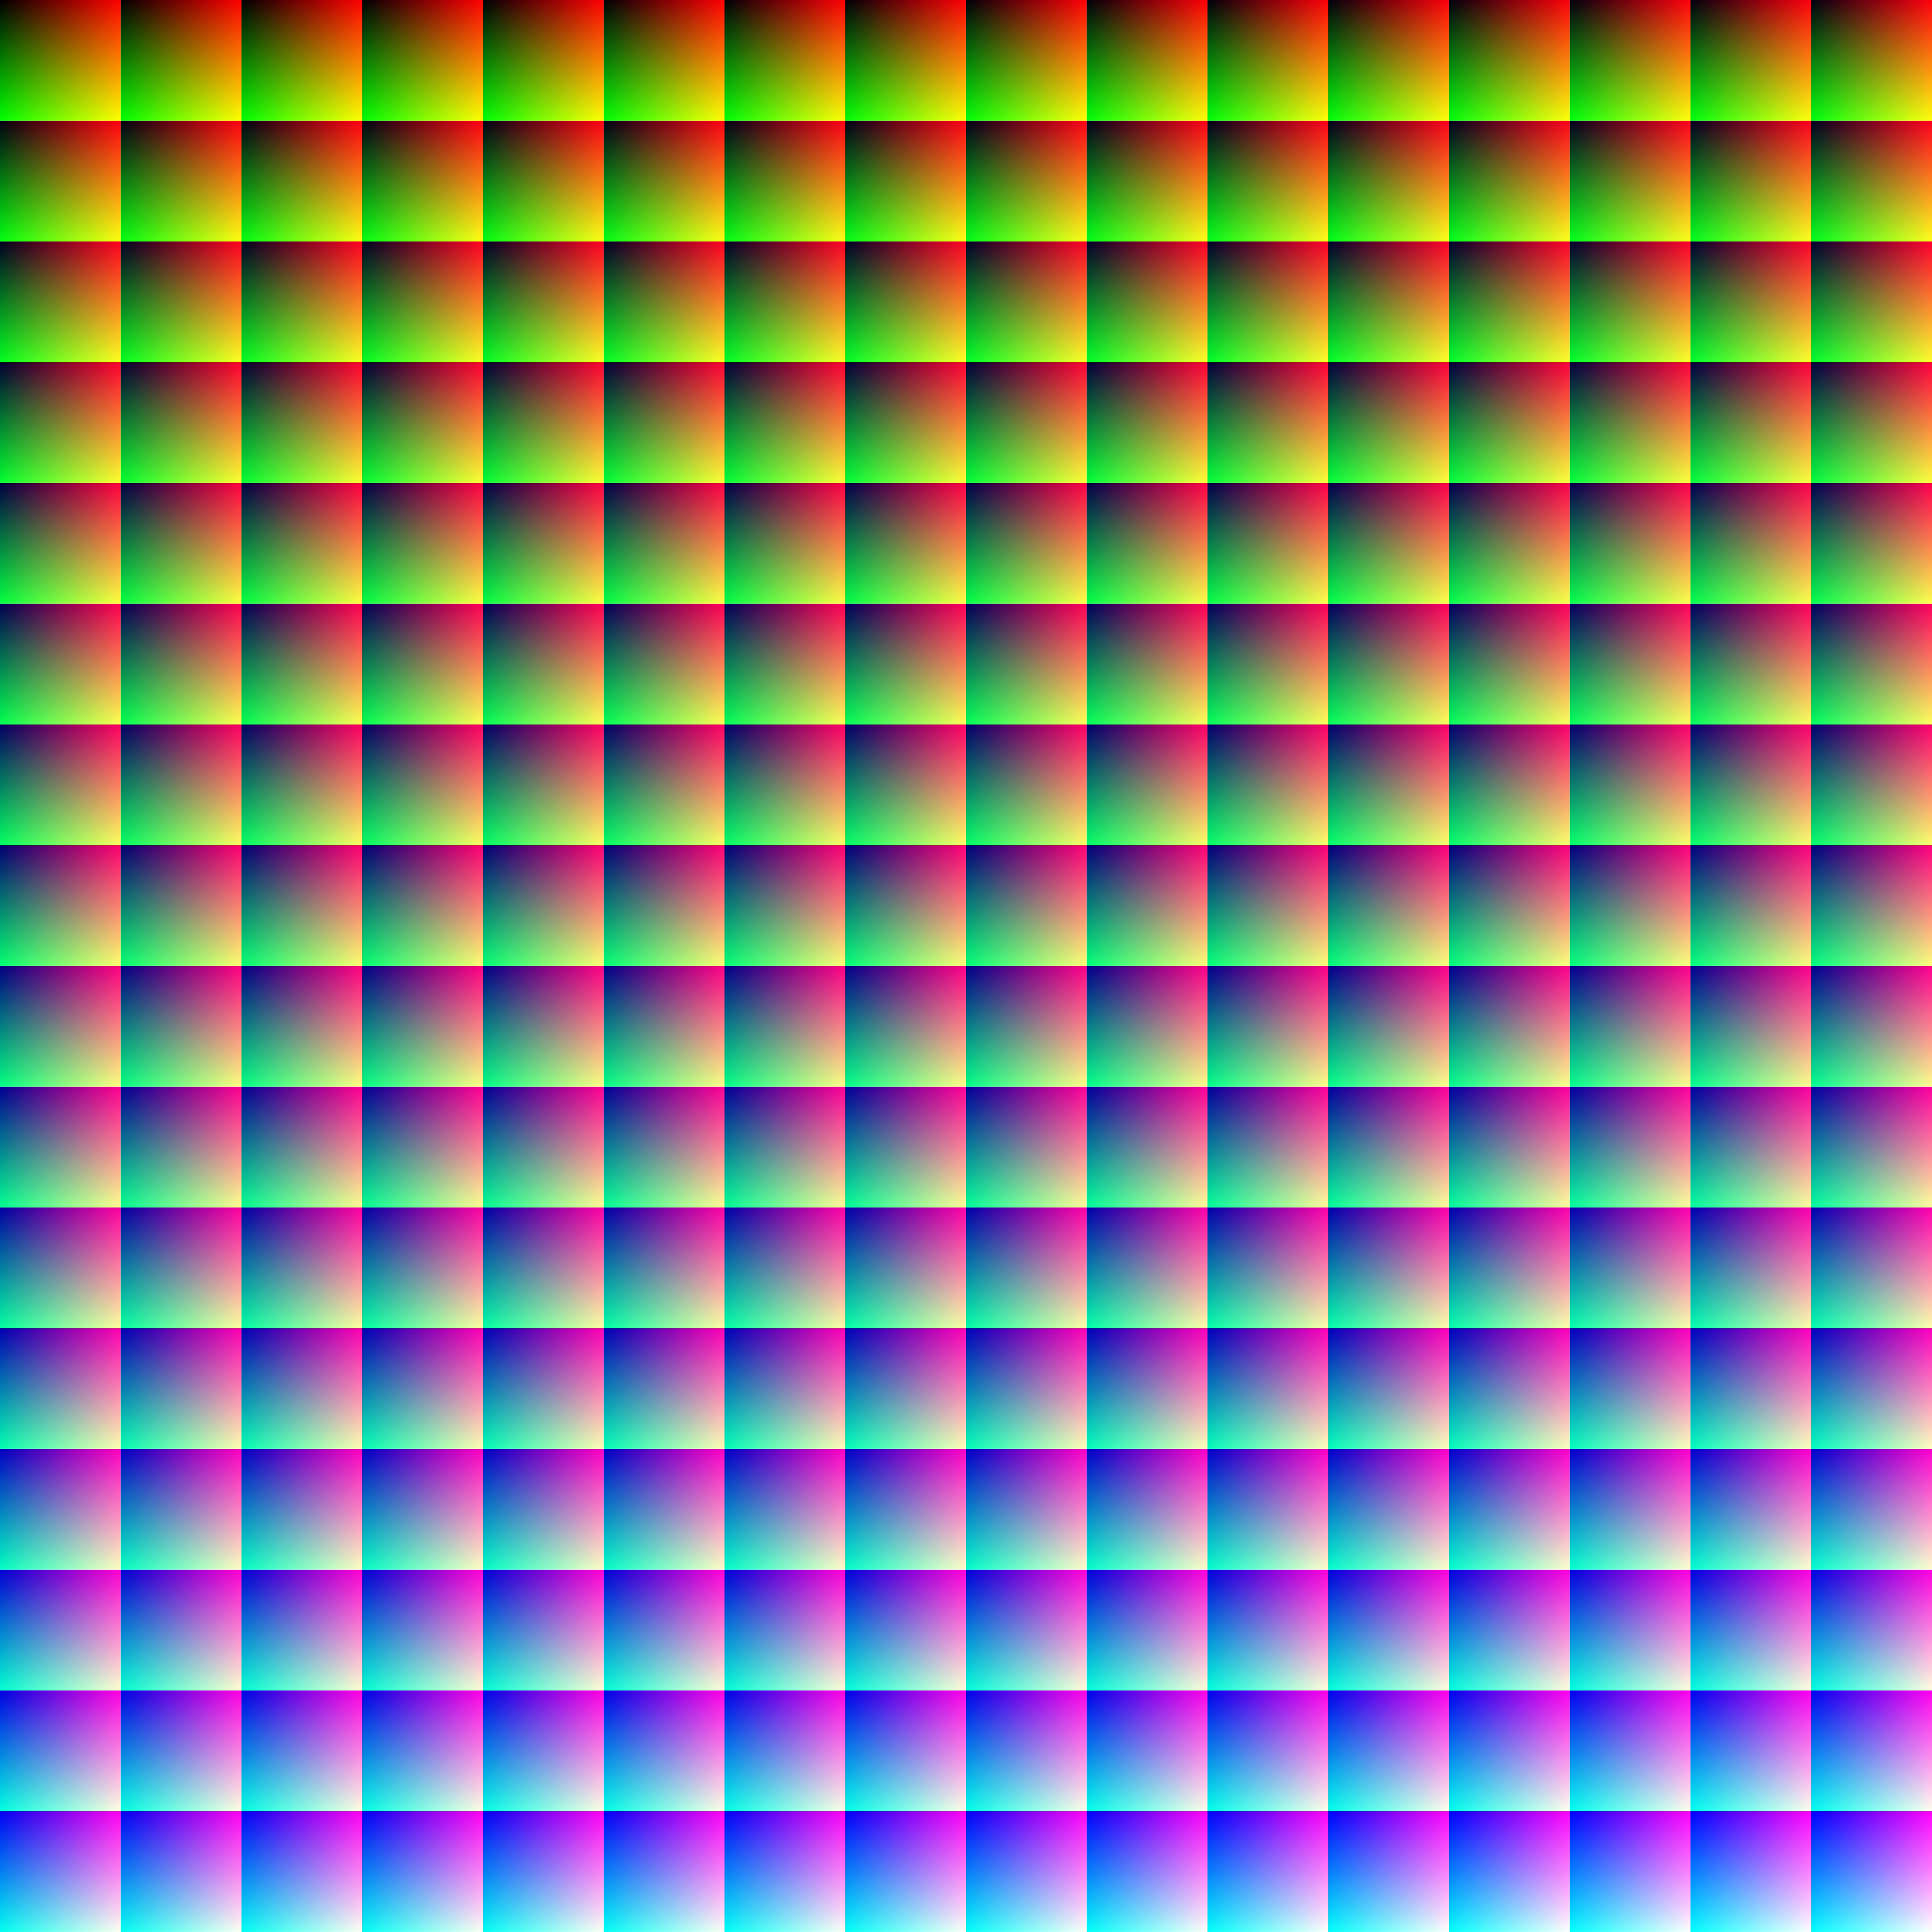 File:Full 24bit RGB palette.png.